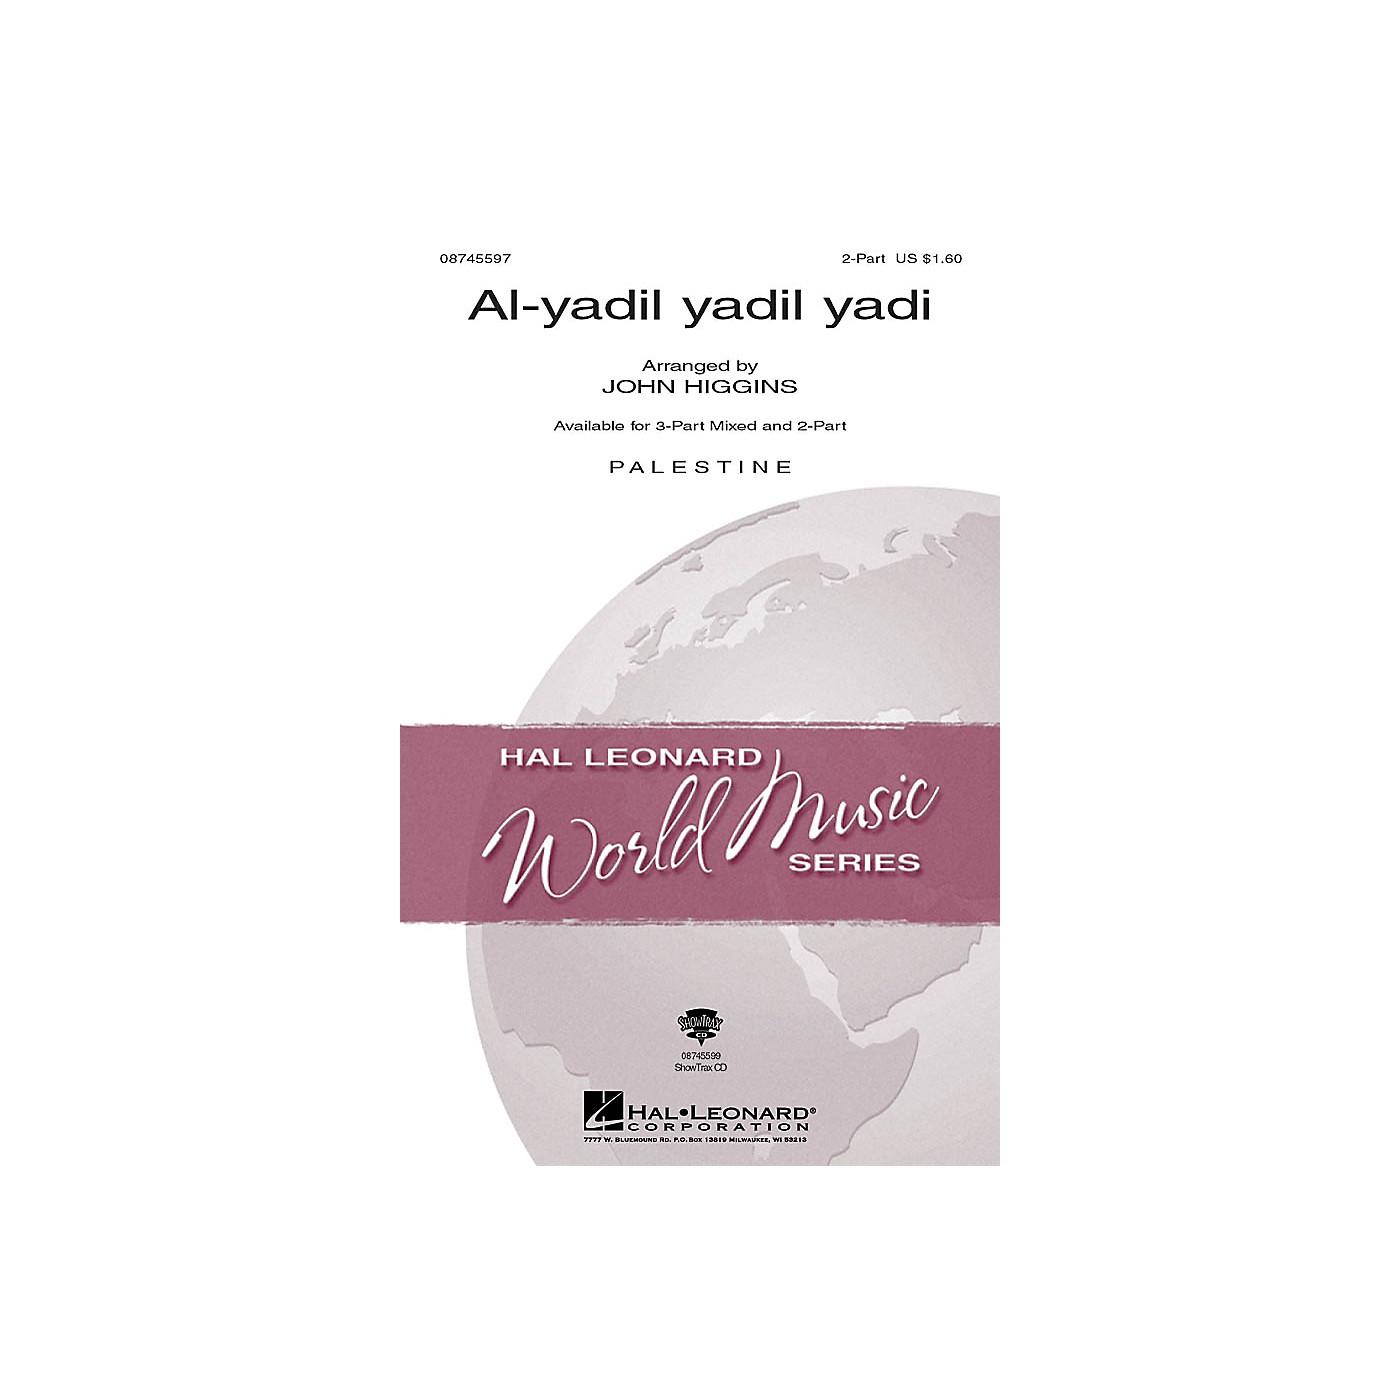 Hal Leonard Al-yadil yadil yadi 2-Part arranged by John Higgins thumbnail